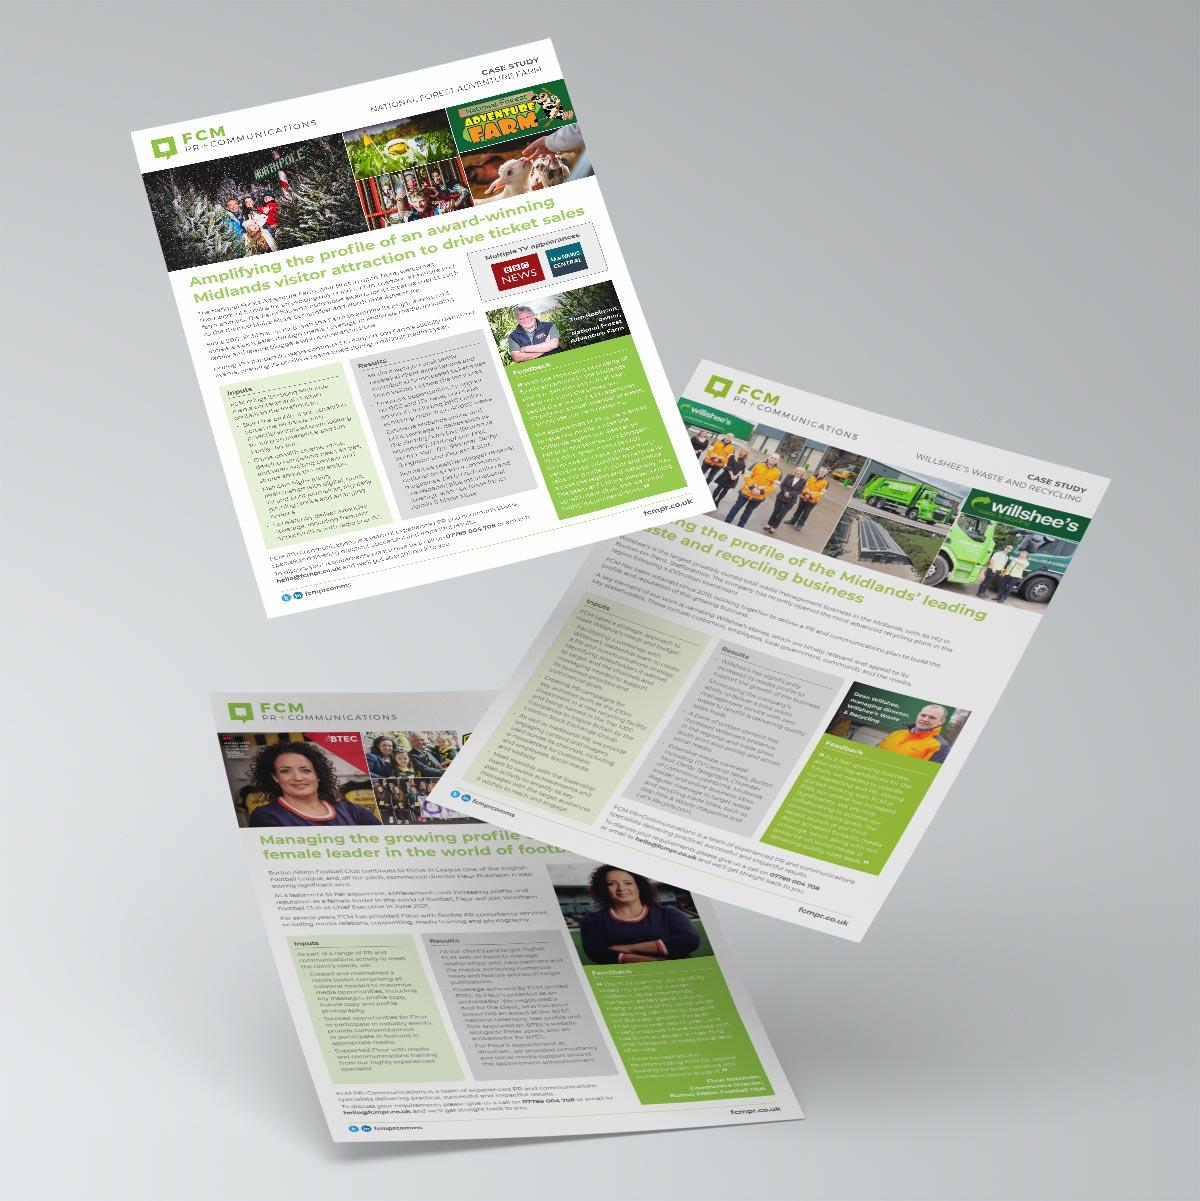 Case study flyers for FCM PR & Communications